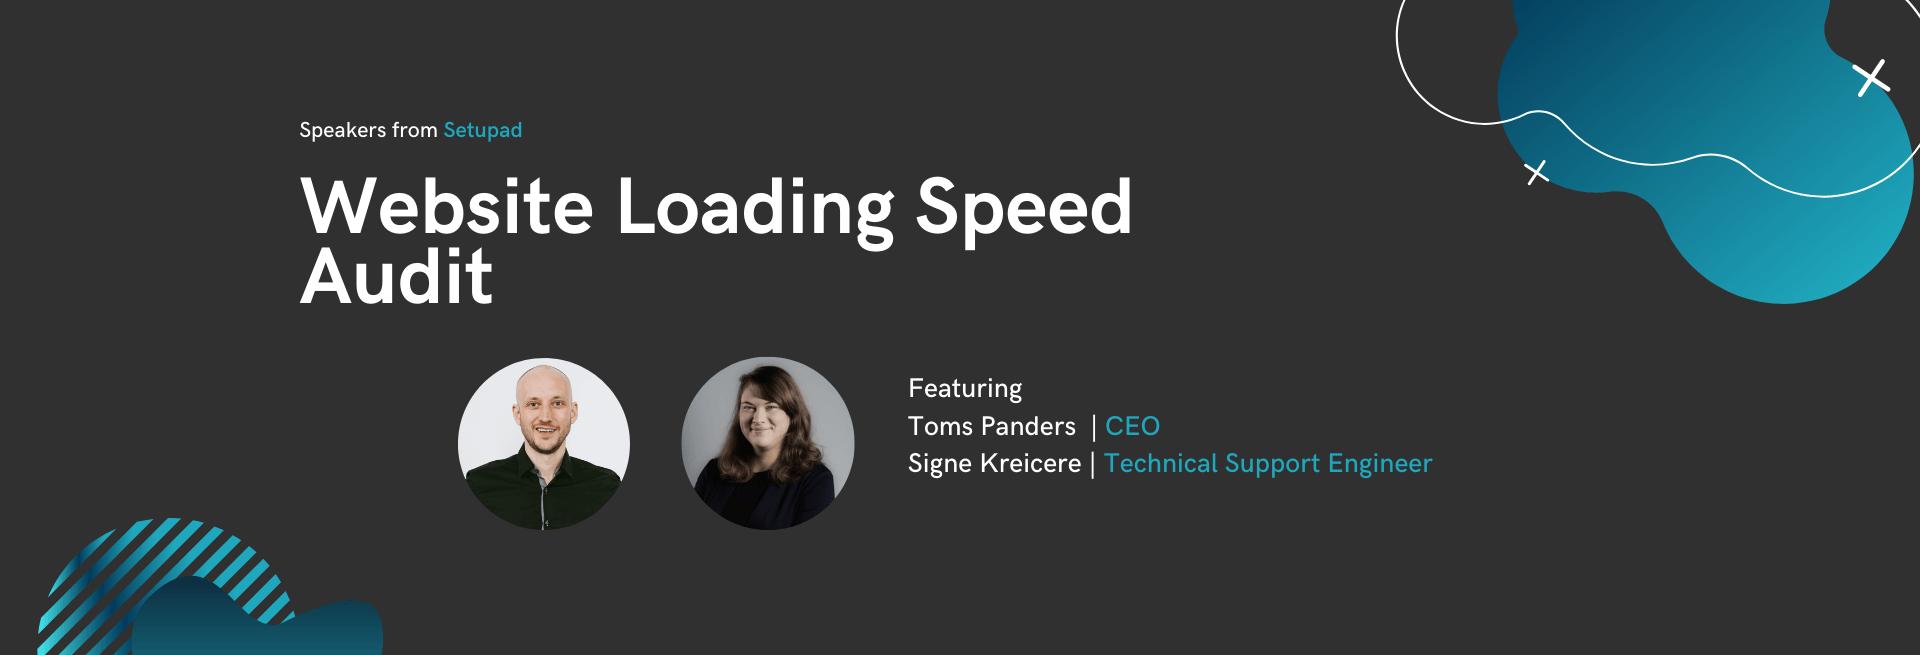 Website Loading Speed Audit | Setupad Webinar